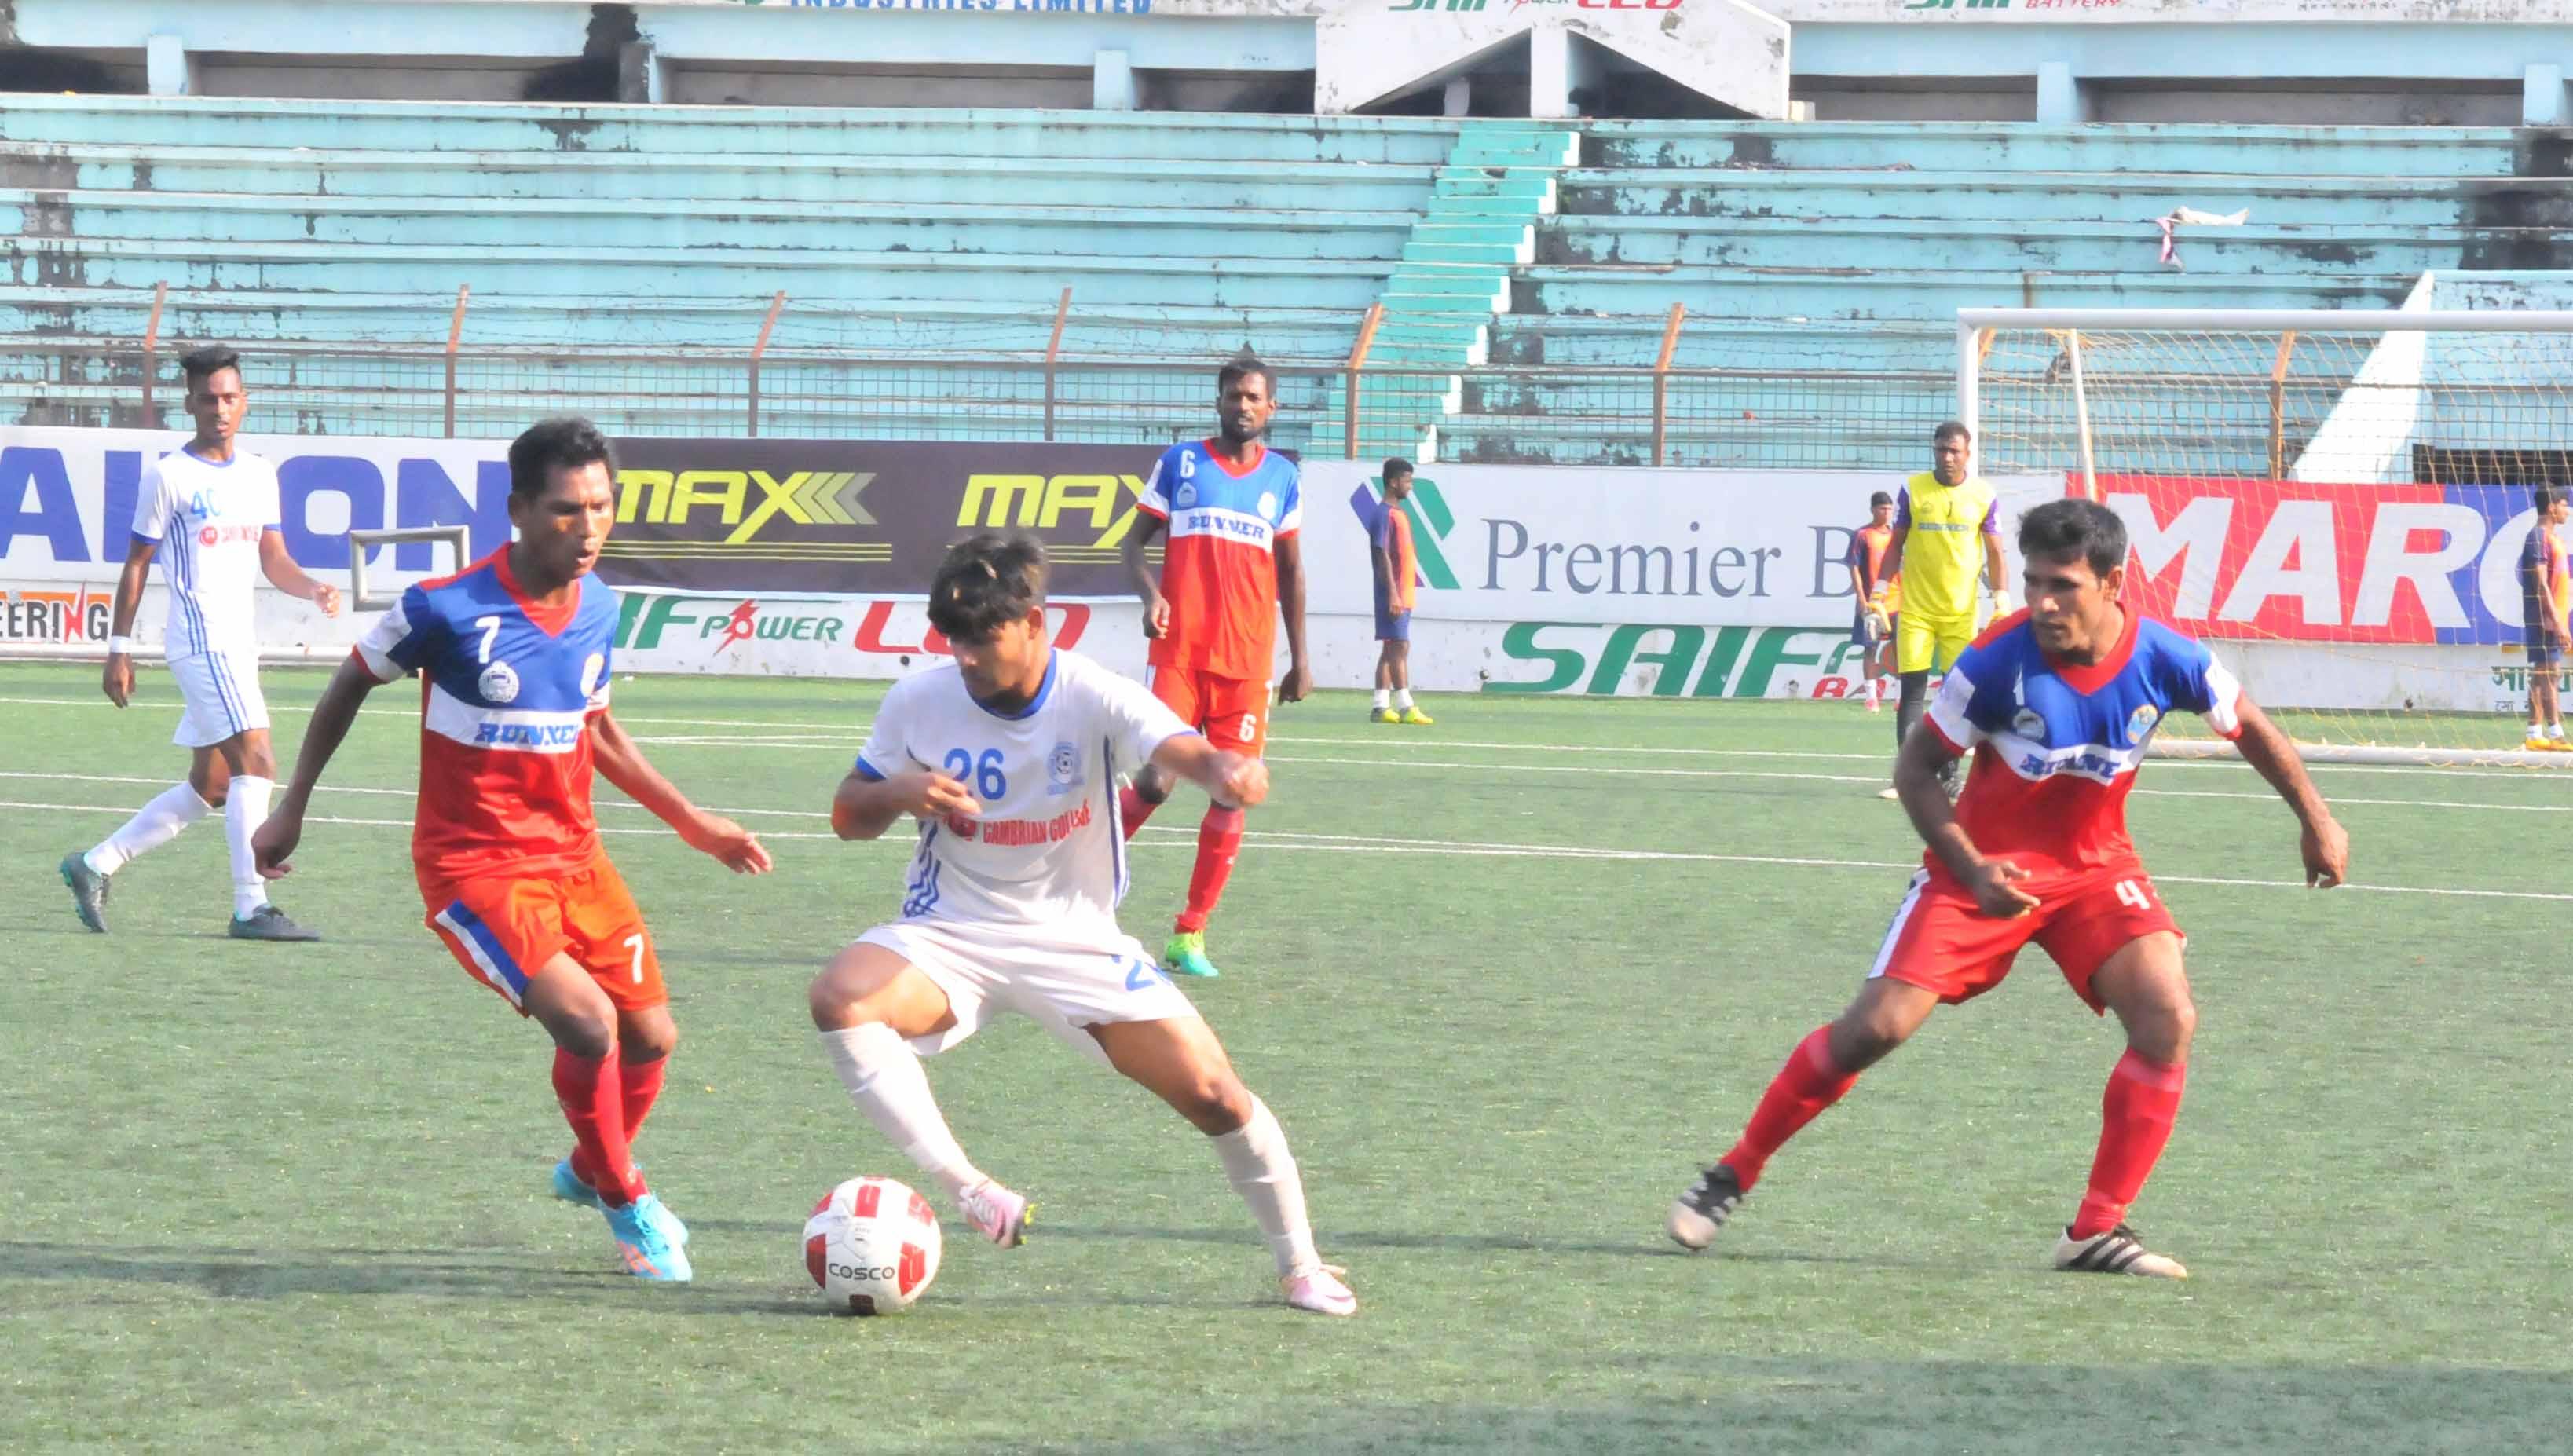 A moment of the match of the Bangladesh Championship League Football between Bangladesh Police Football Club and Uttar Baridhara Club at the Bir Shreshtha Shaheed Sepoy Mohammad Mostafa Kamal Stadium in the city's Kamalapur on Sunday. Bangladesh Police Football Club won the match 2-1.